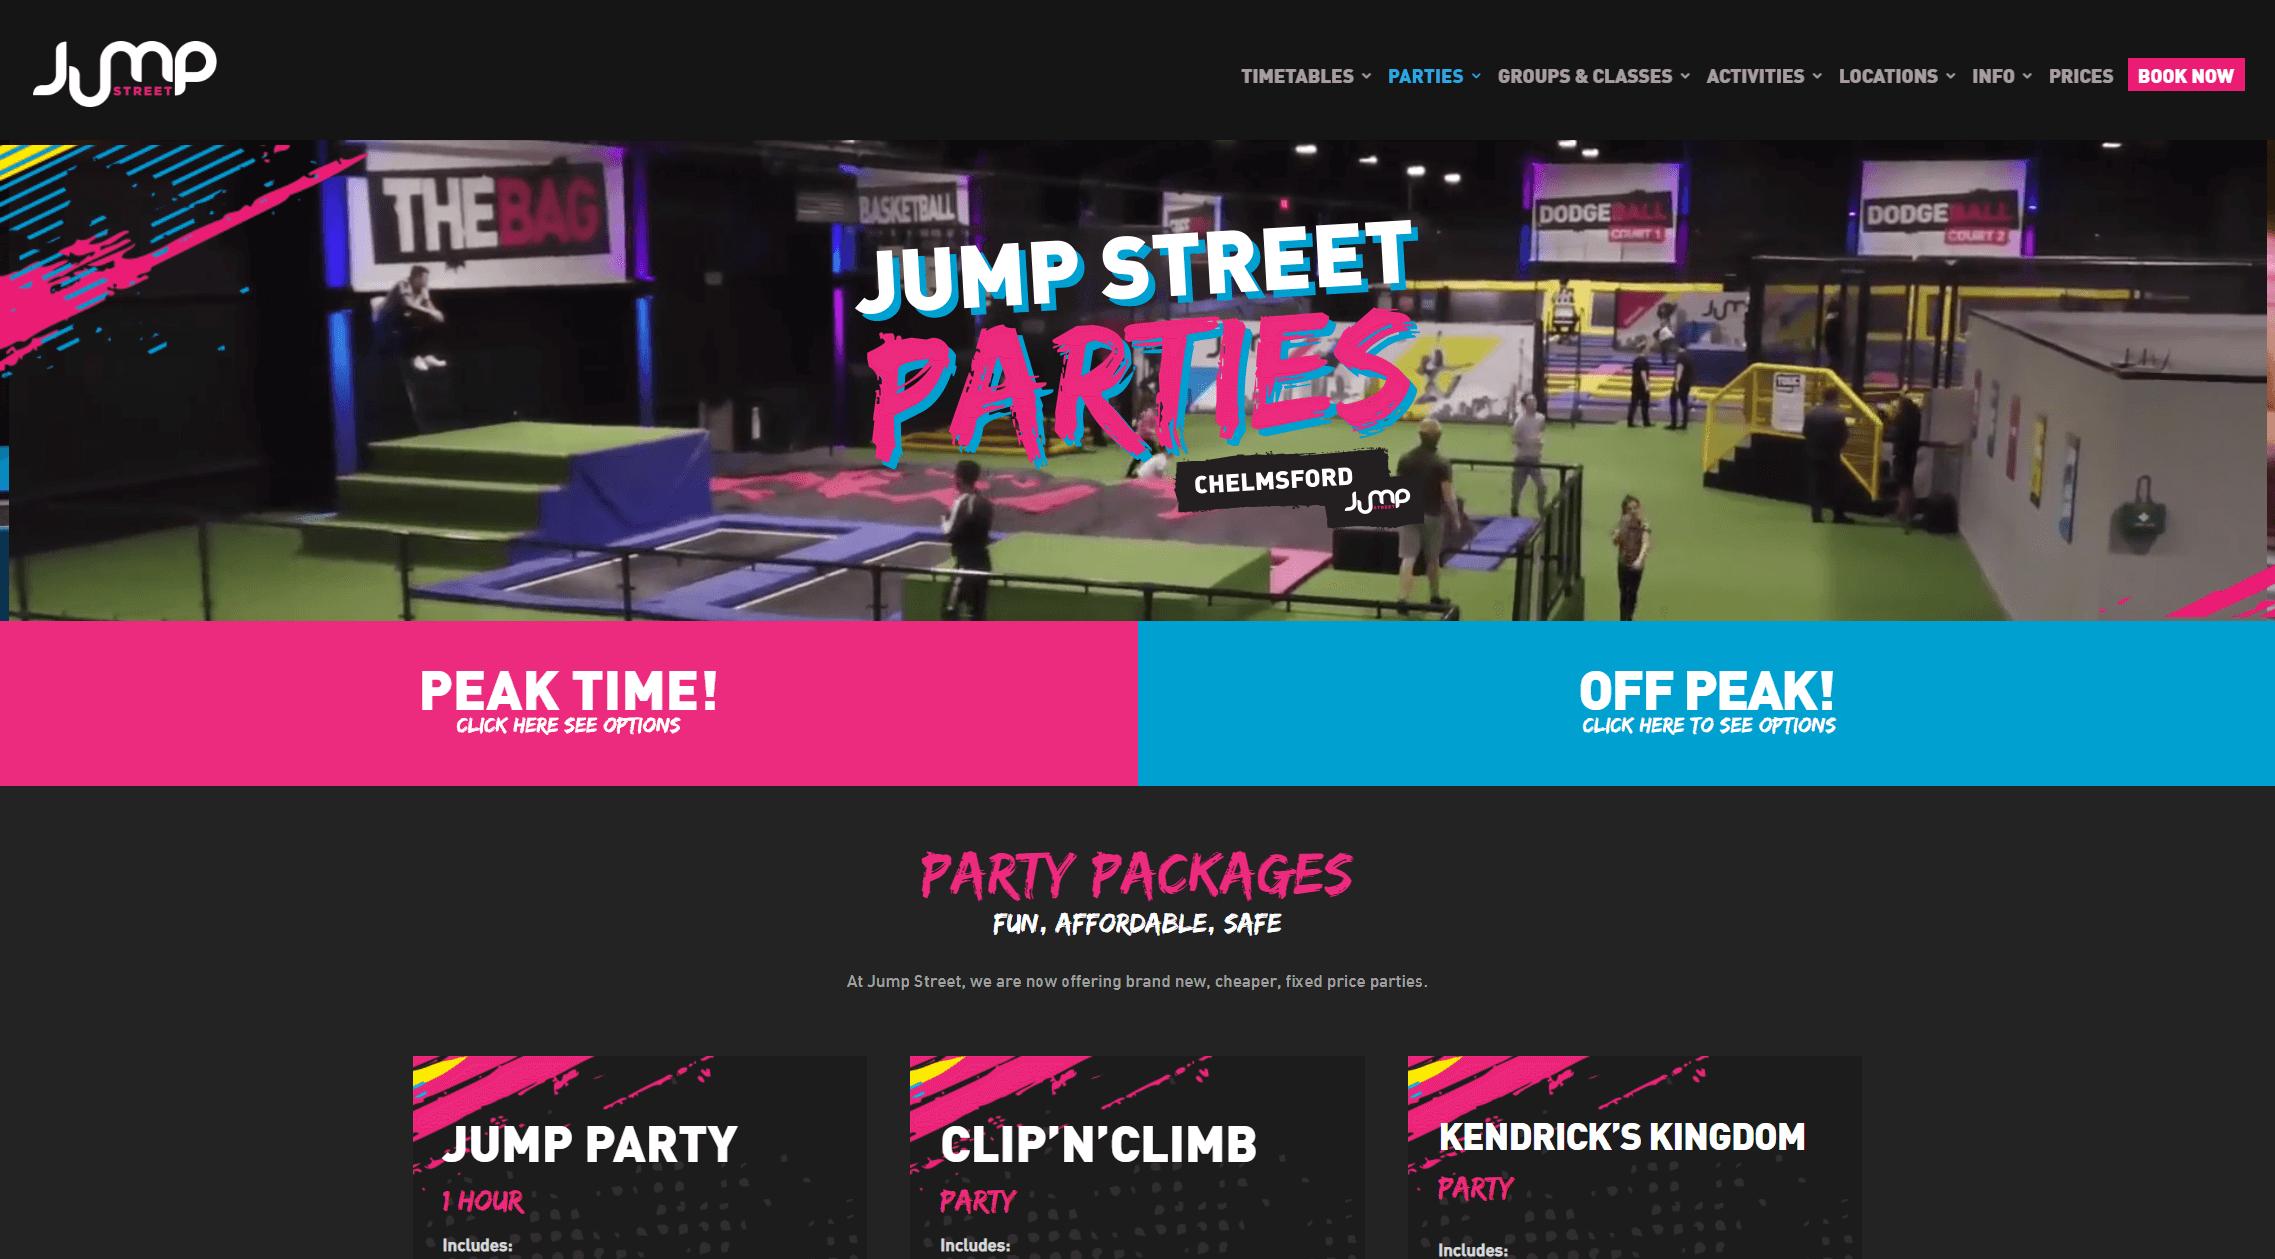 jumpstreet.co.uk-3